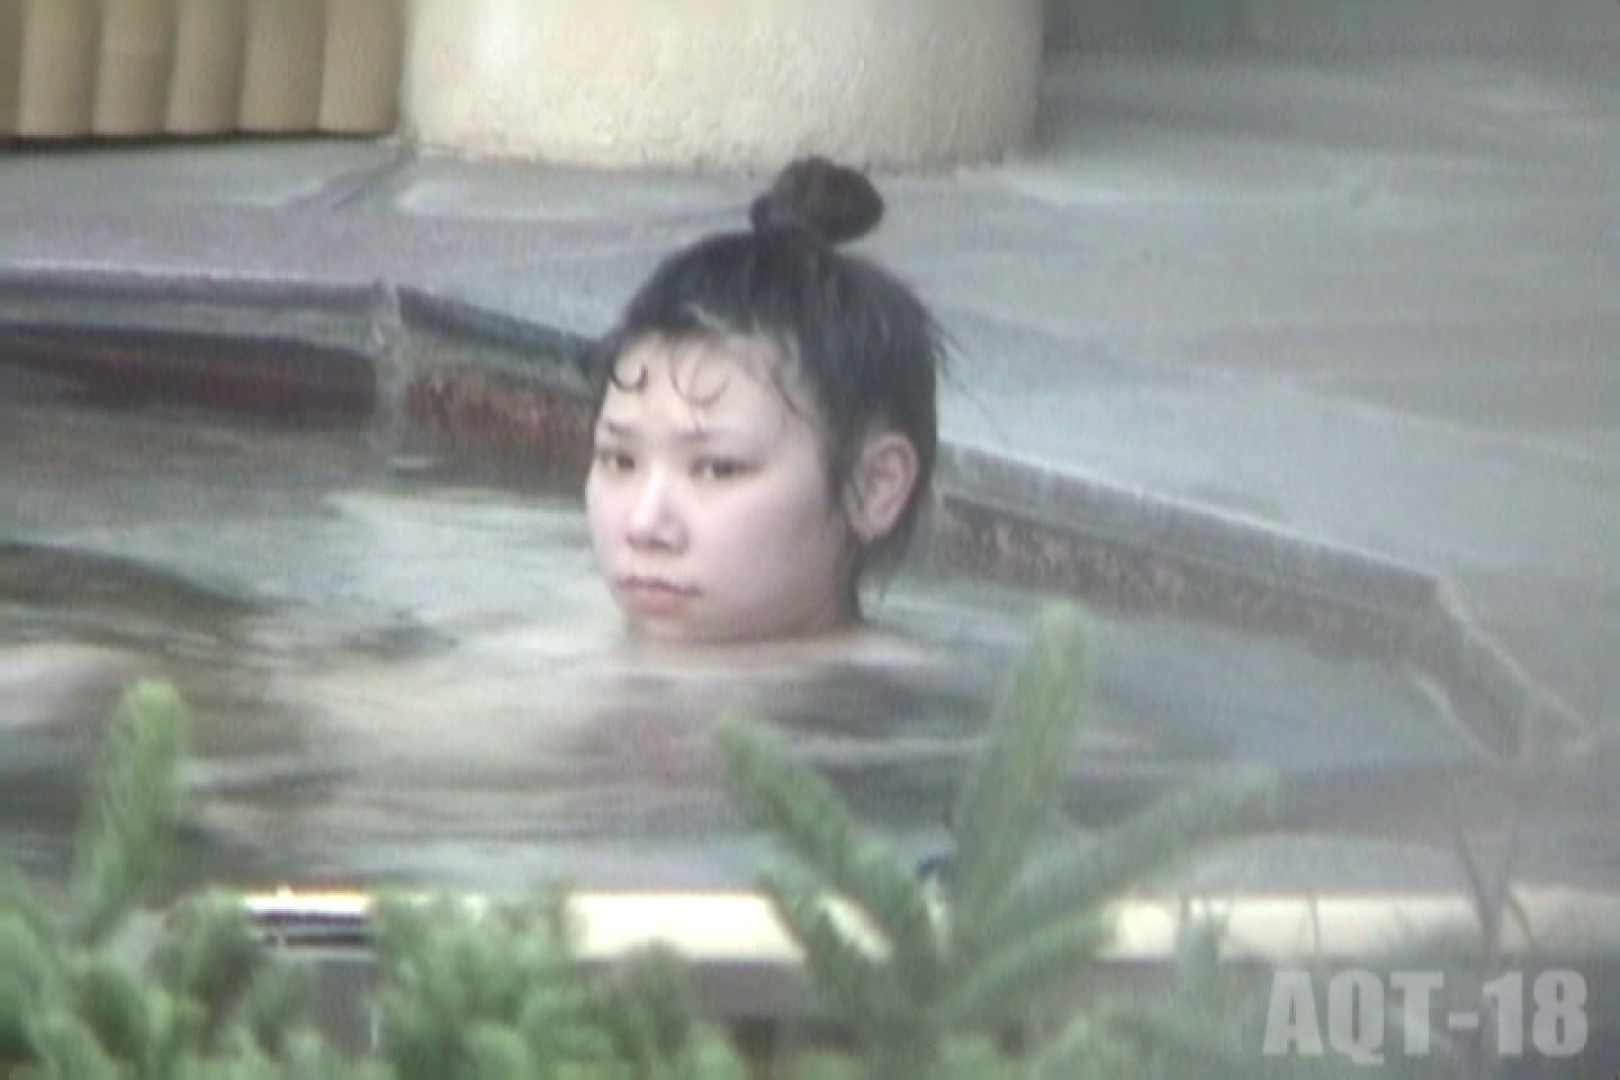 Aquaな露天風呂Vol.855 露天 | OLセックス  67画像 4